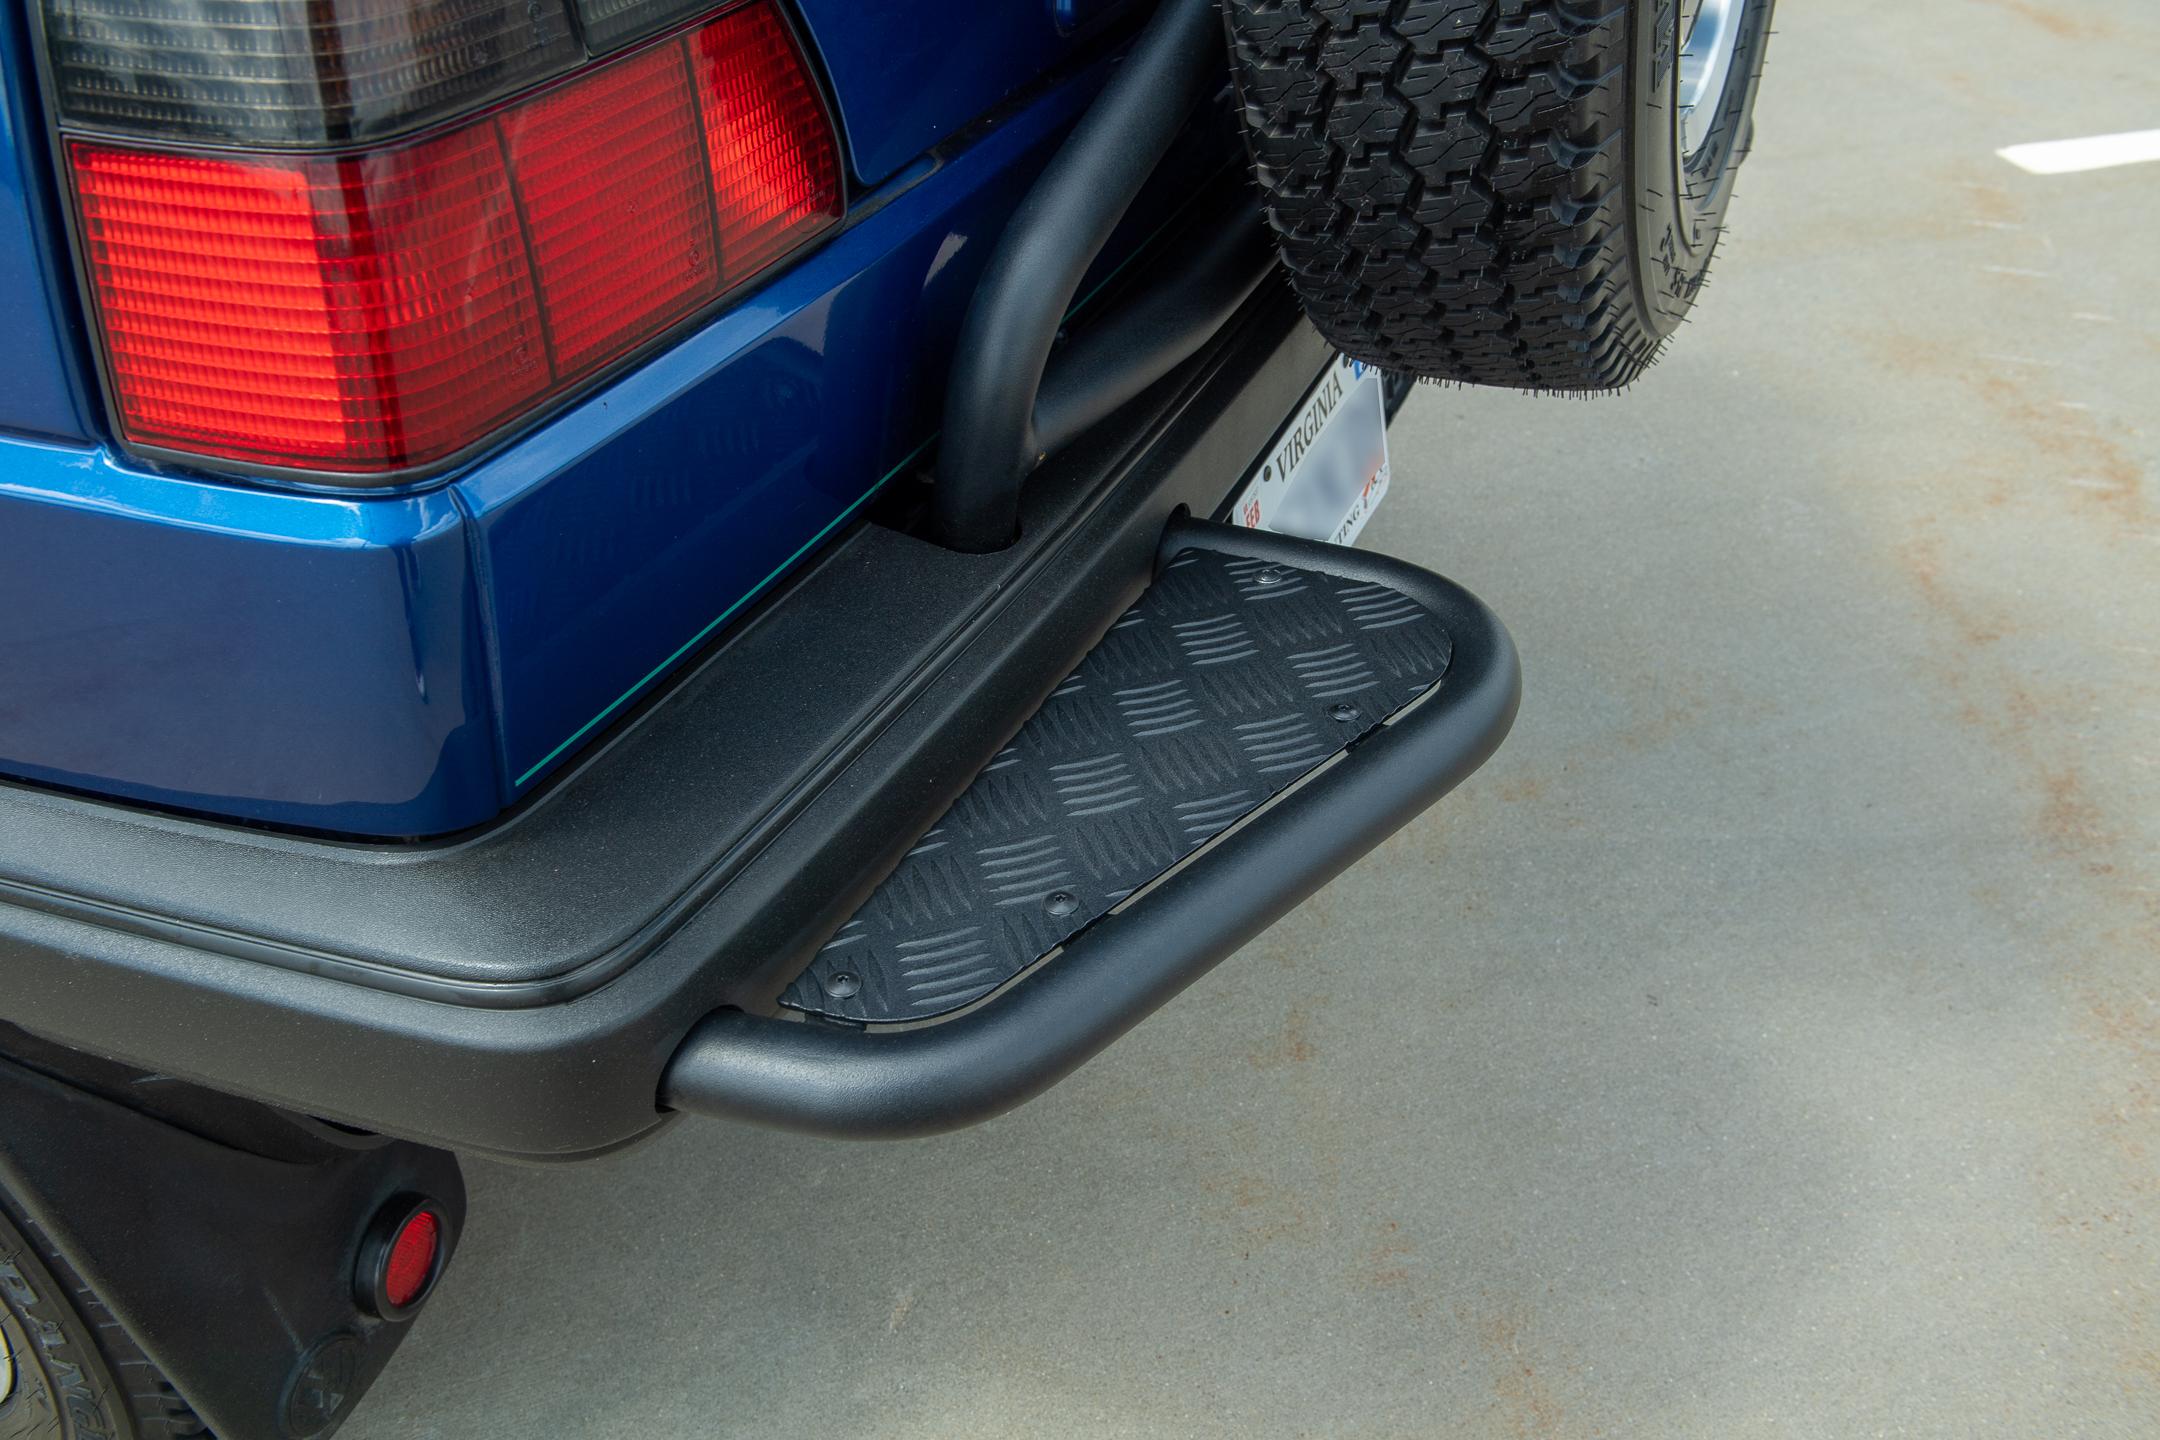 Volkswagen Golf Country rear bumper step